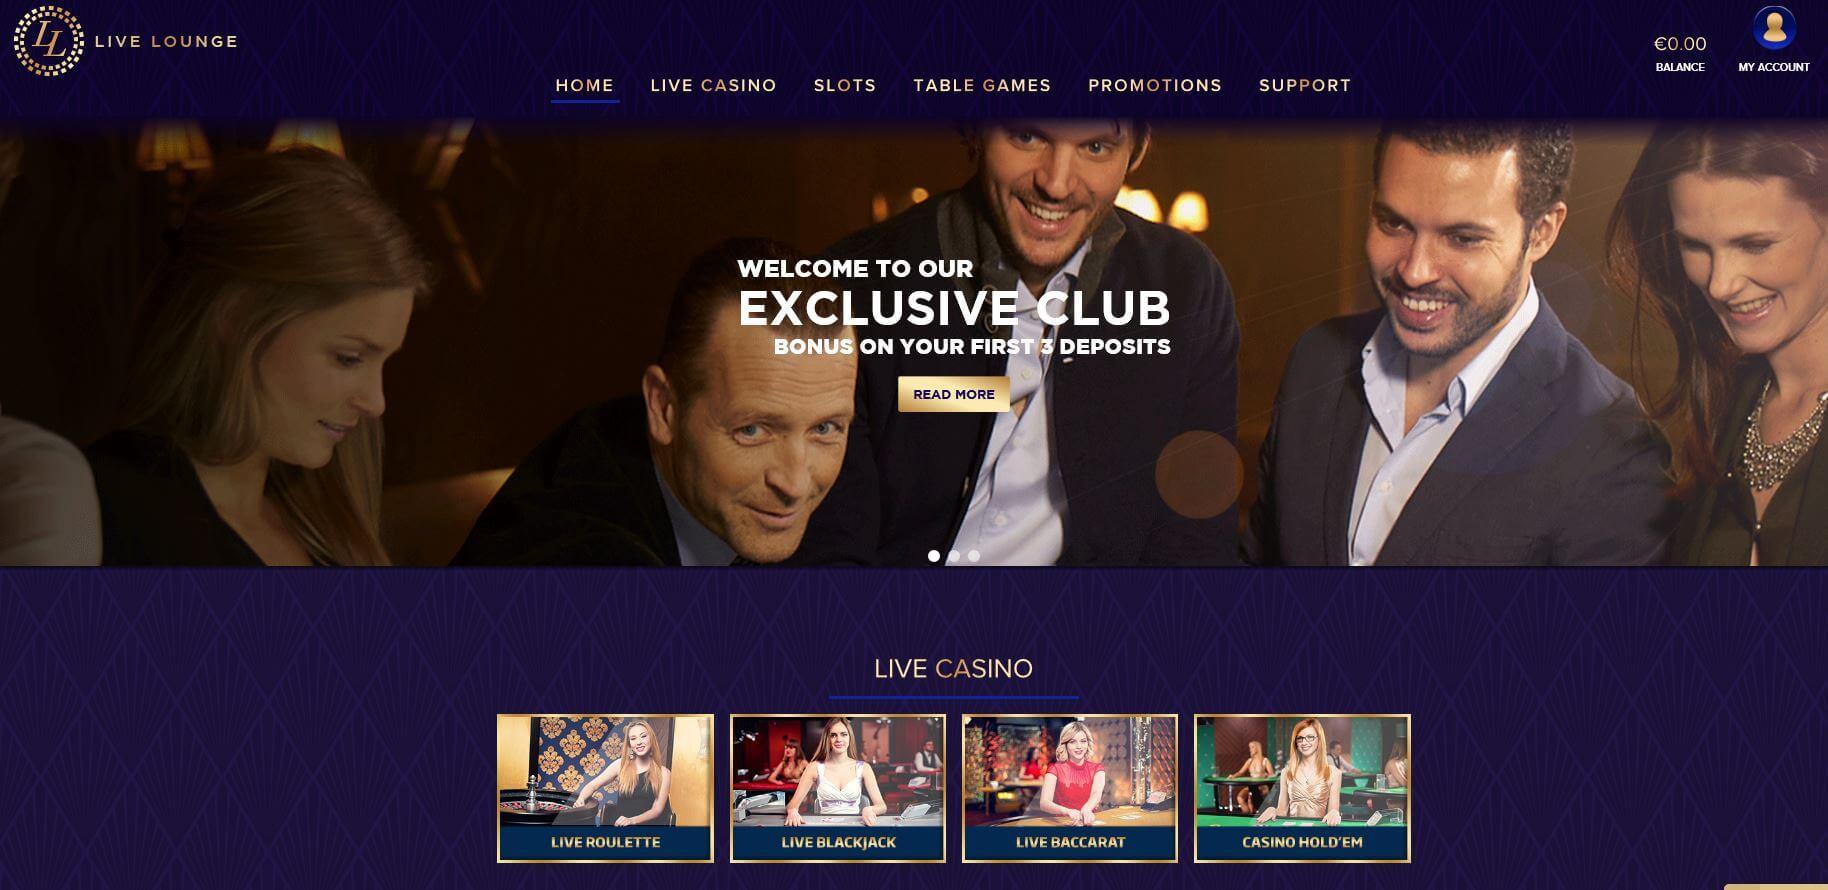 Live Lounge Live Casino